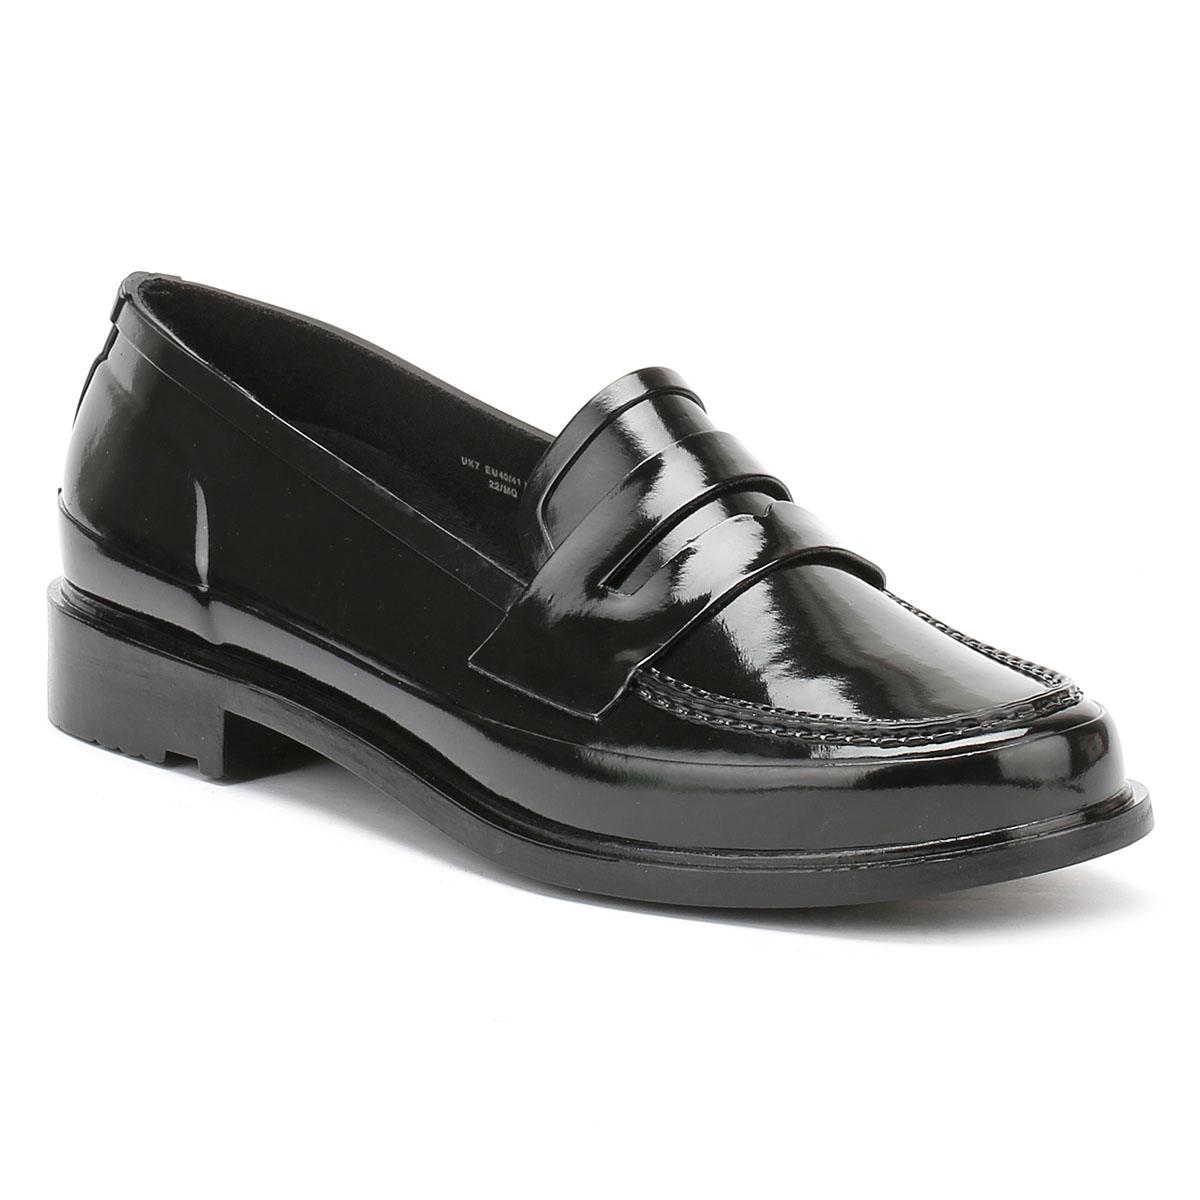 Hunter Shoes Uk